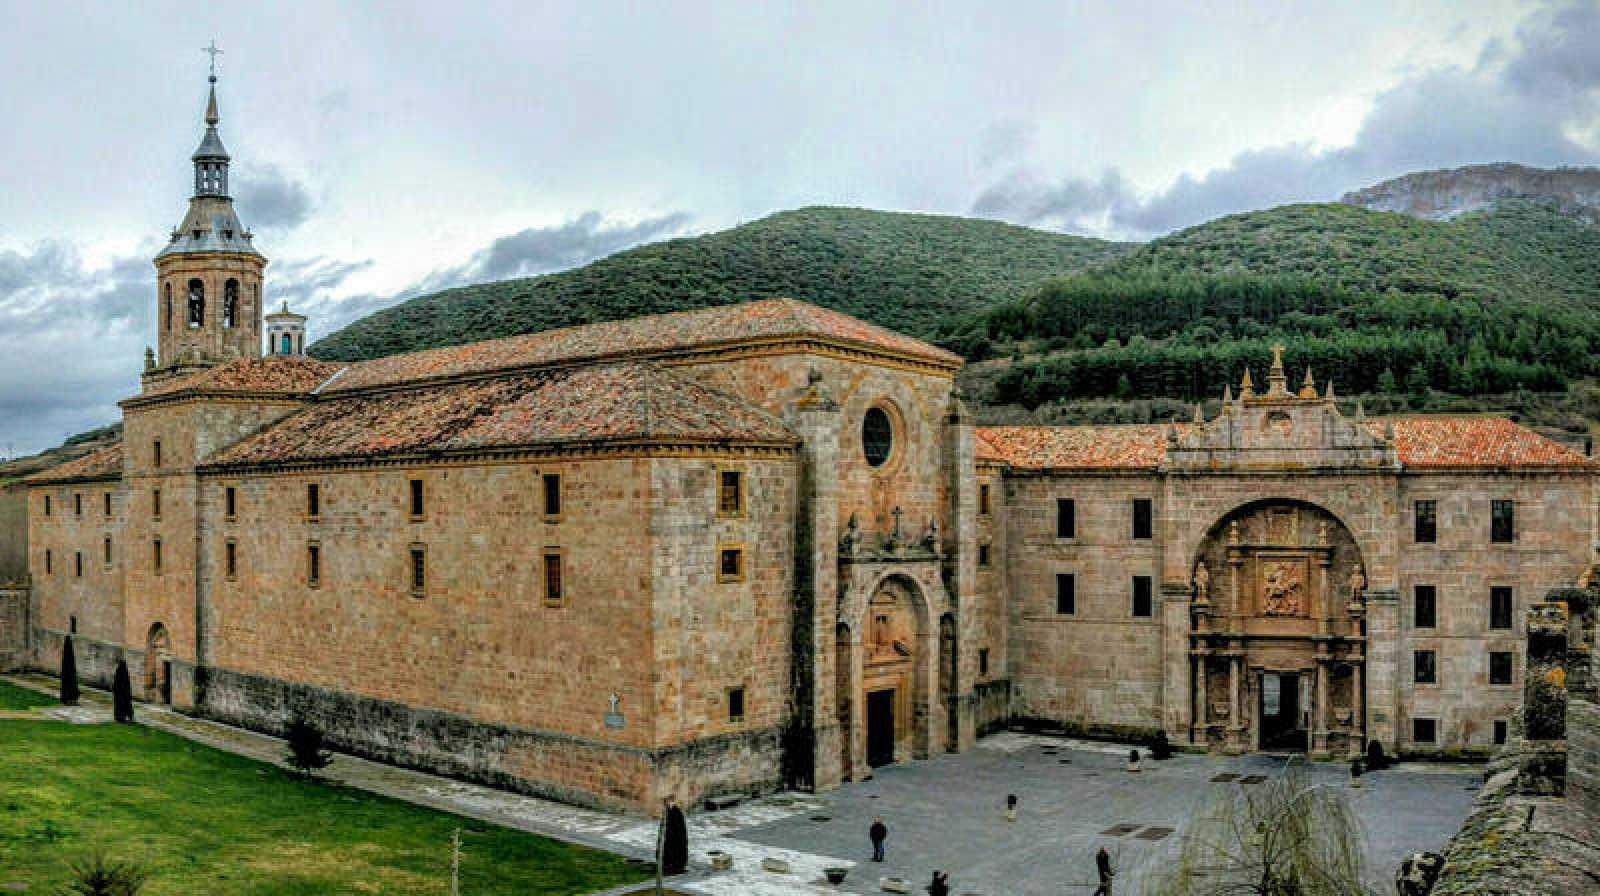 Real Monasterio de San Millán de Yuso